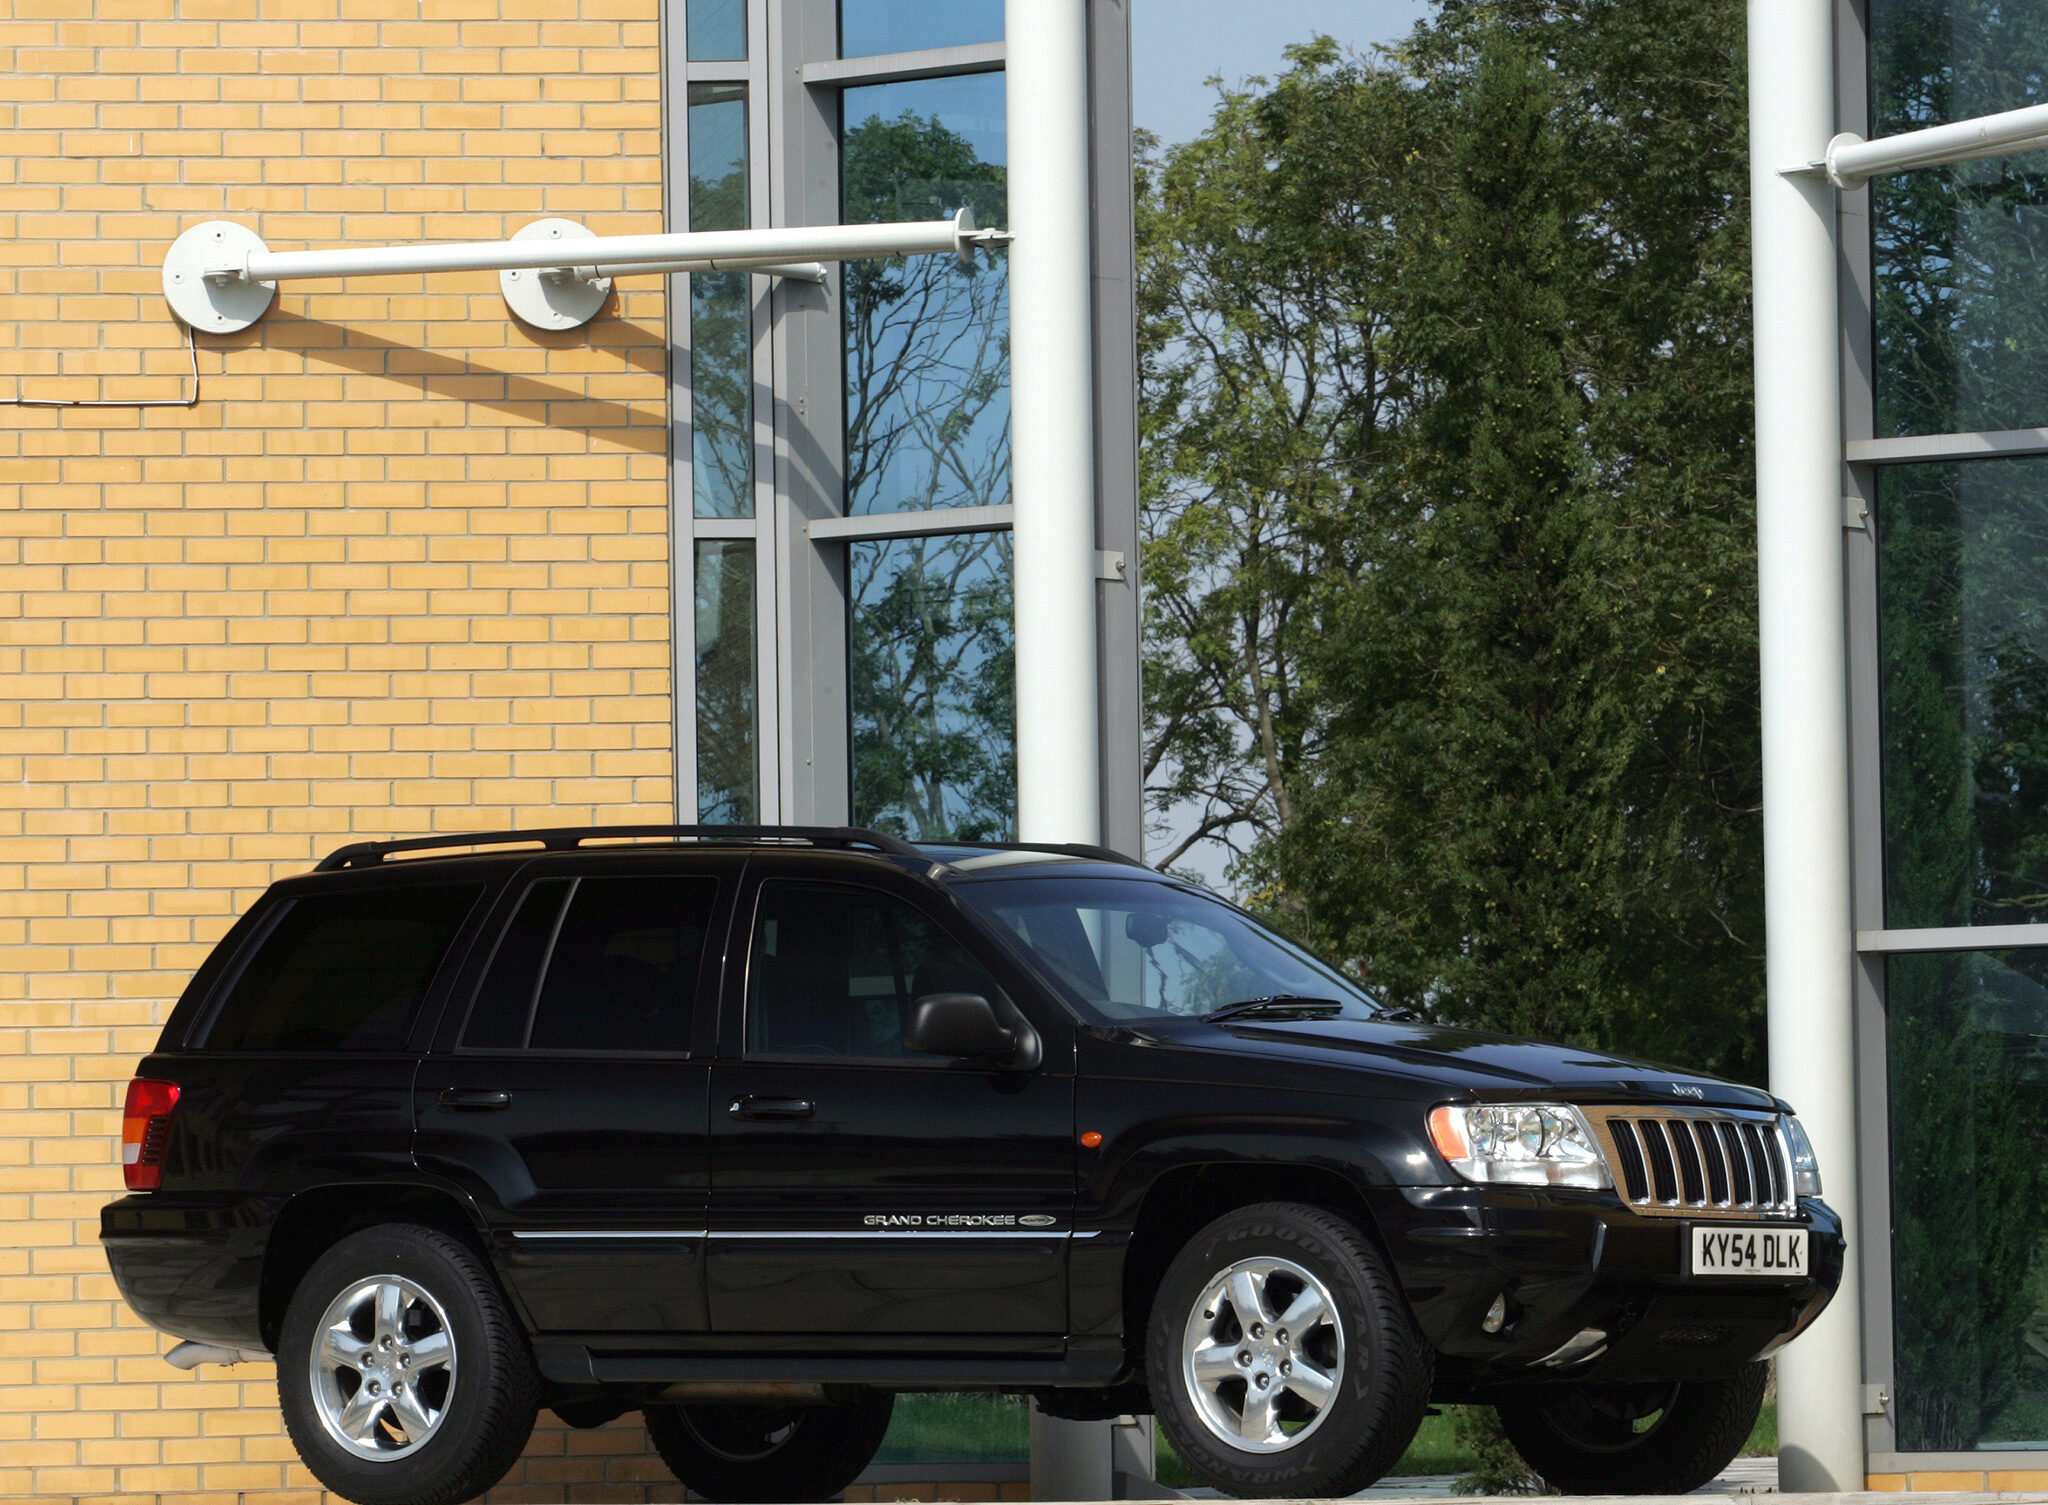 2004 Jeep Grand Cherokee wallpapers